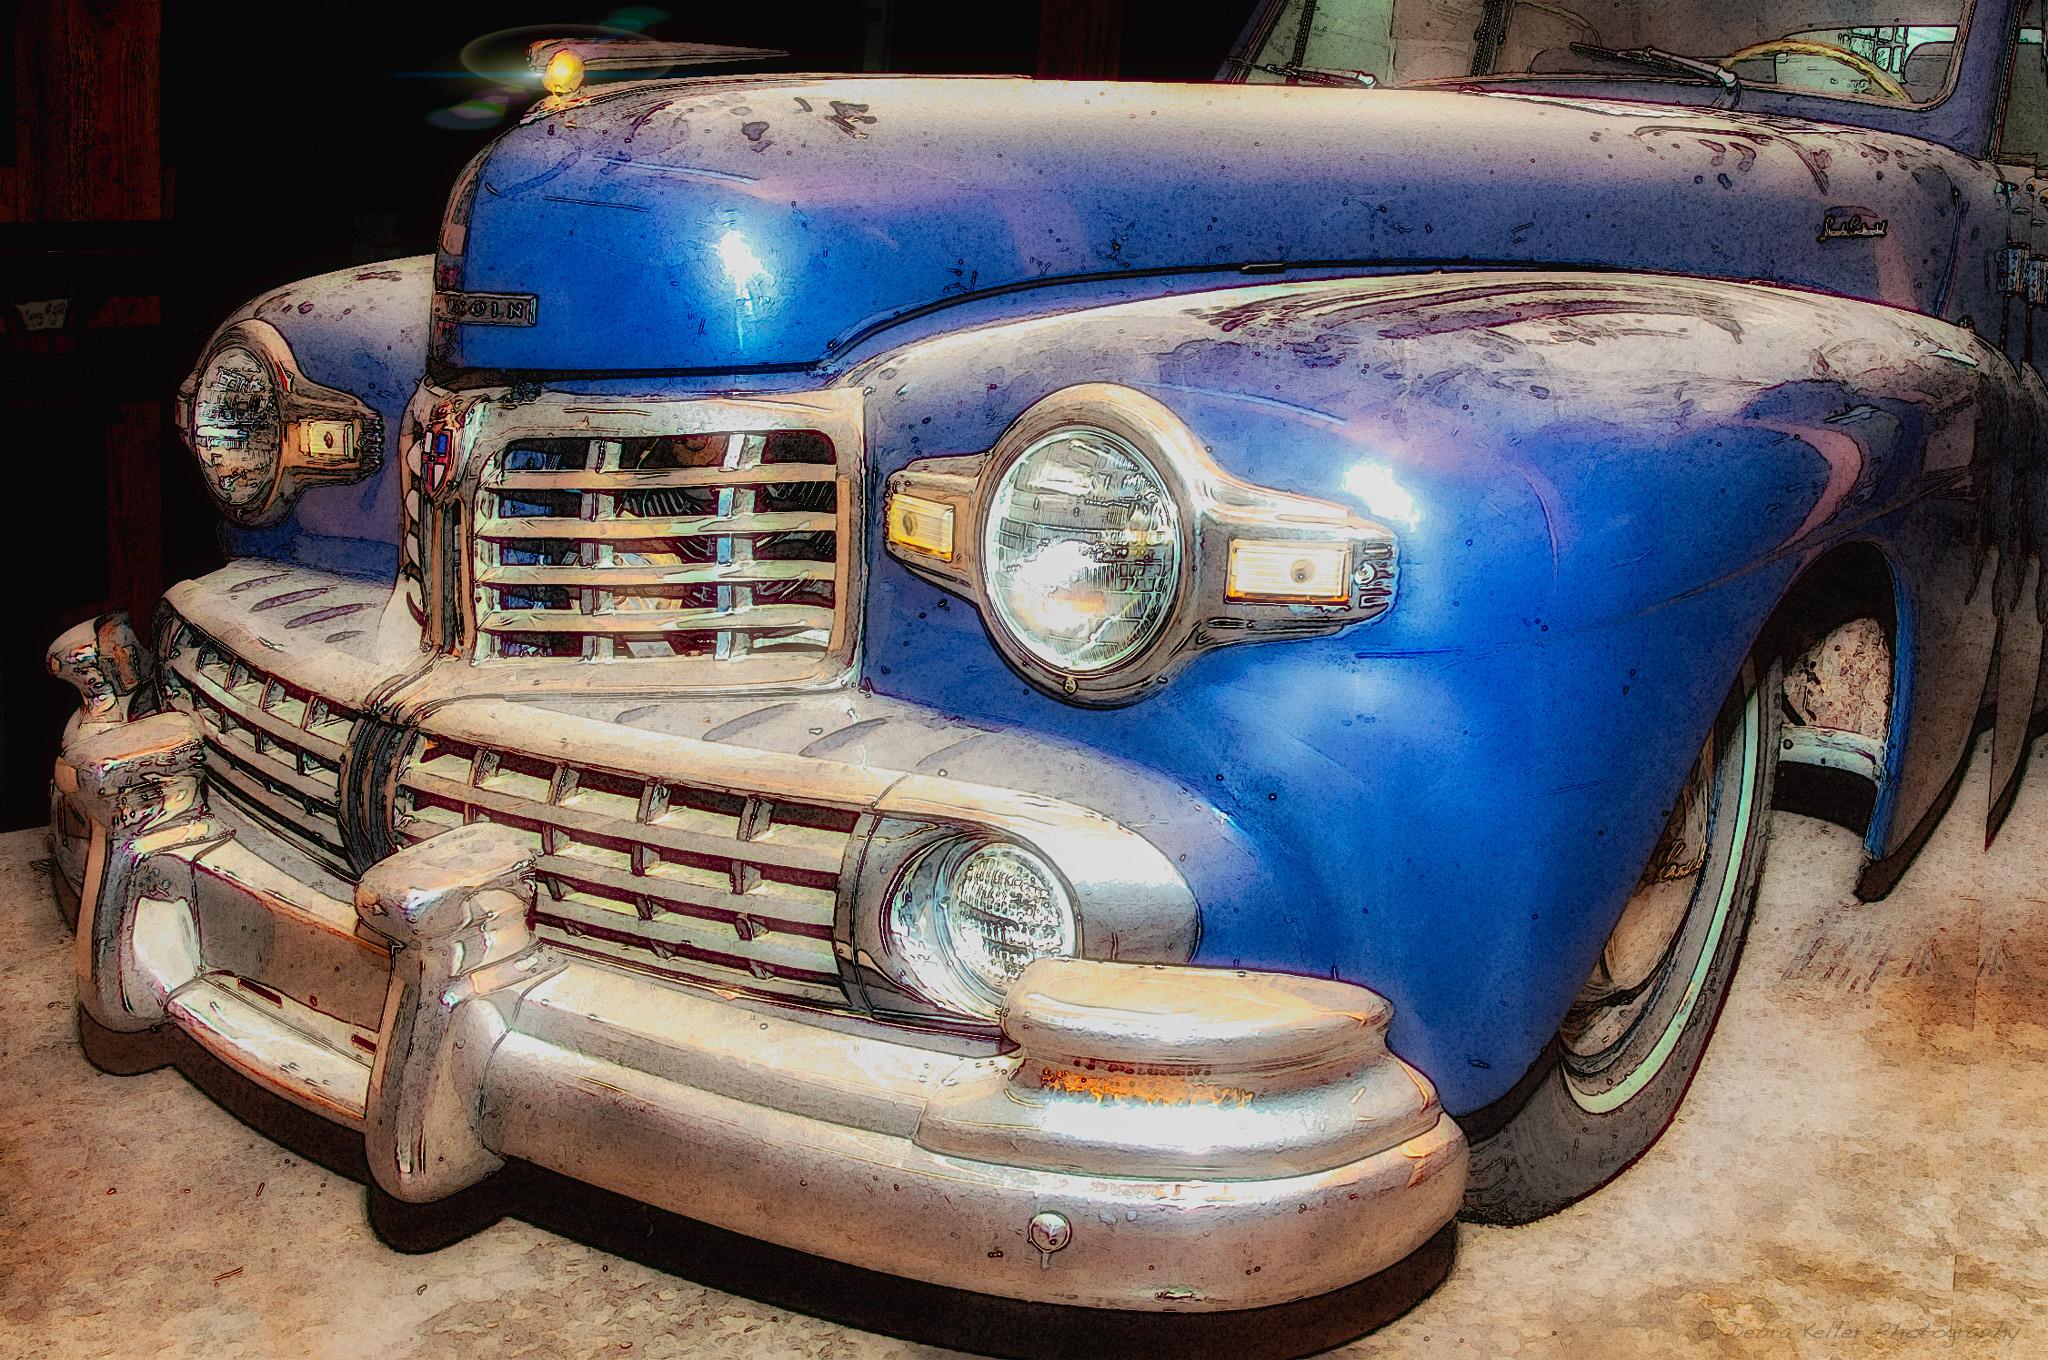 The Cars Lost And Forgotten « Debra Faith Keller